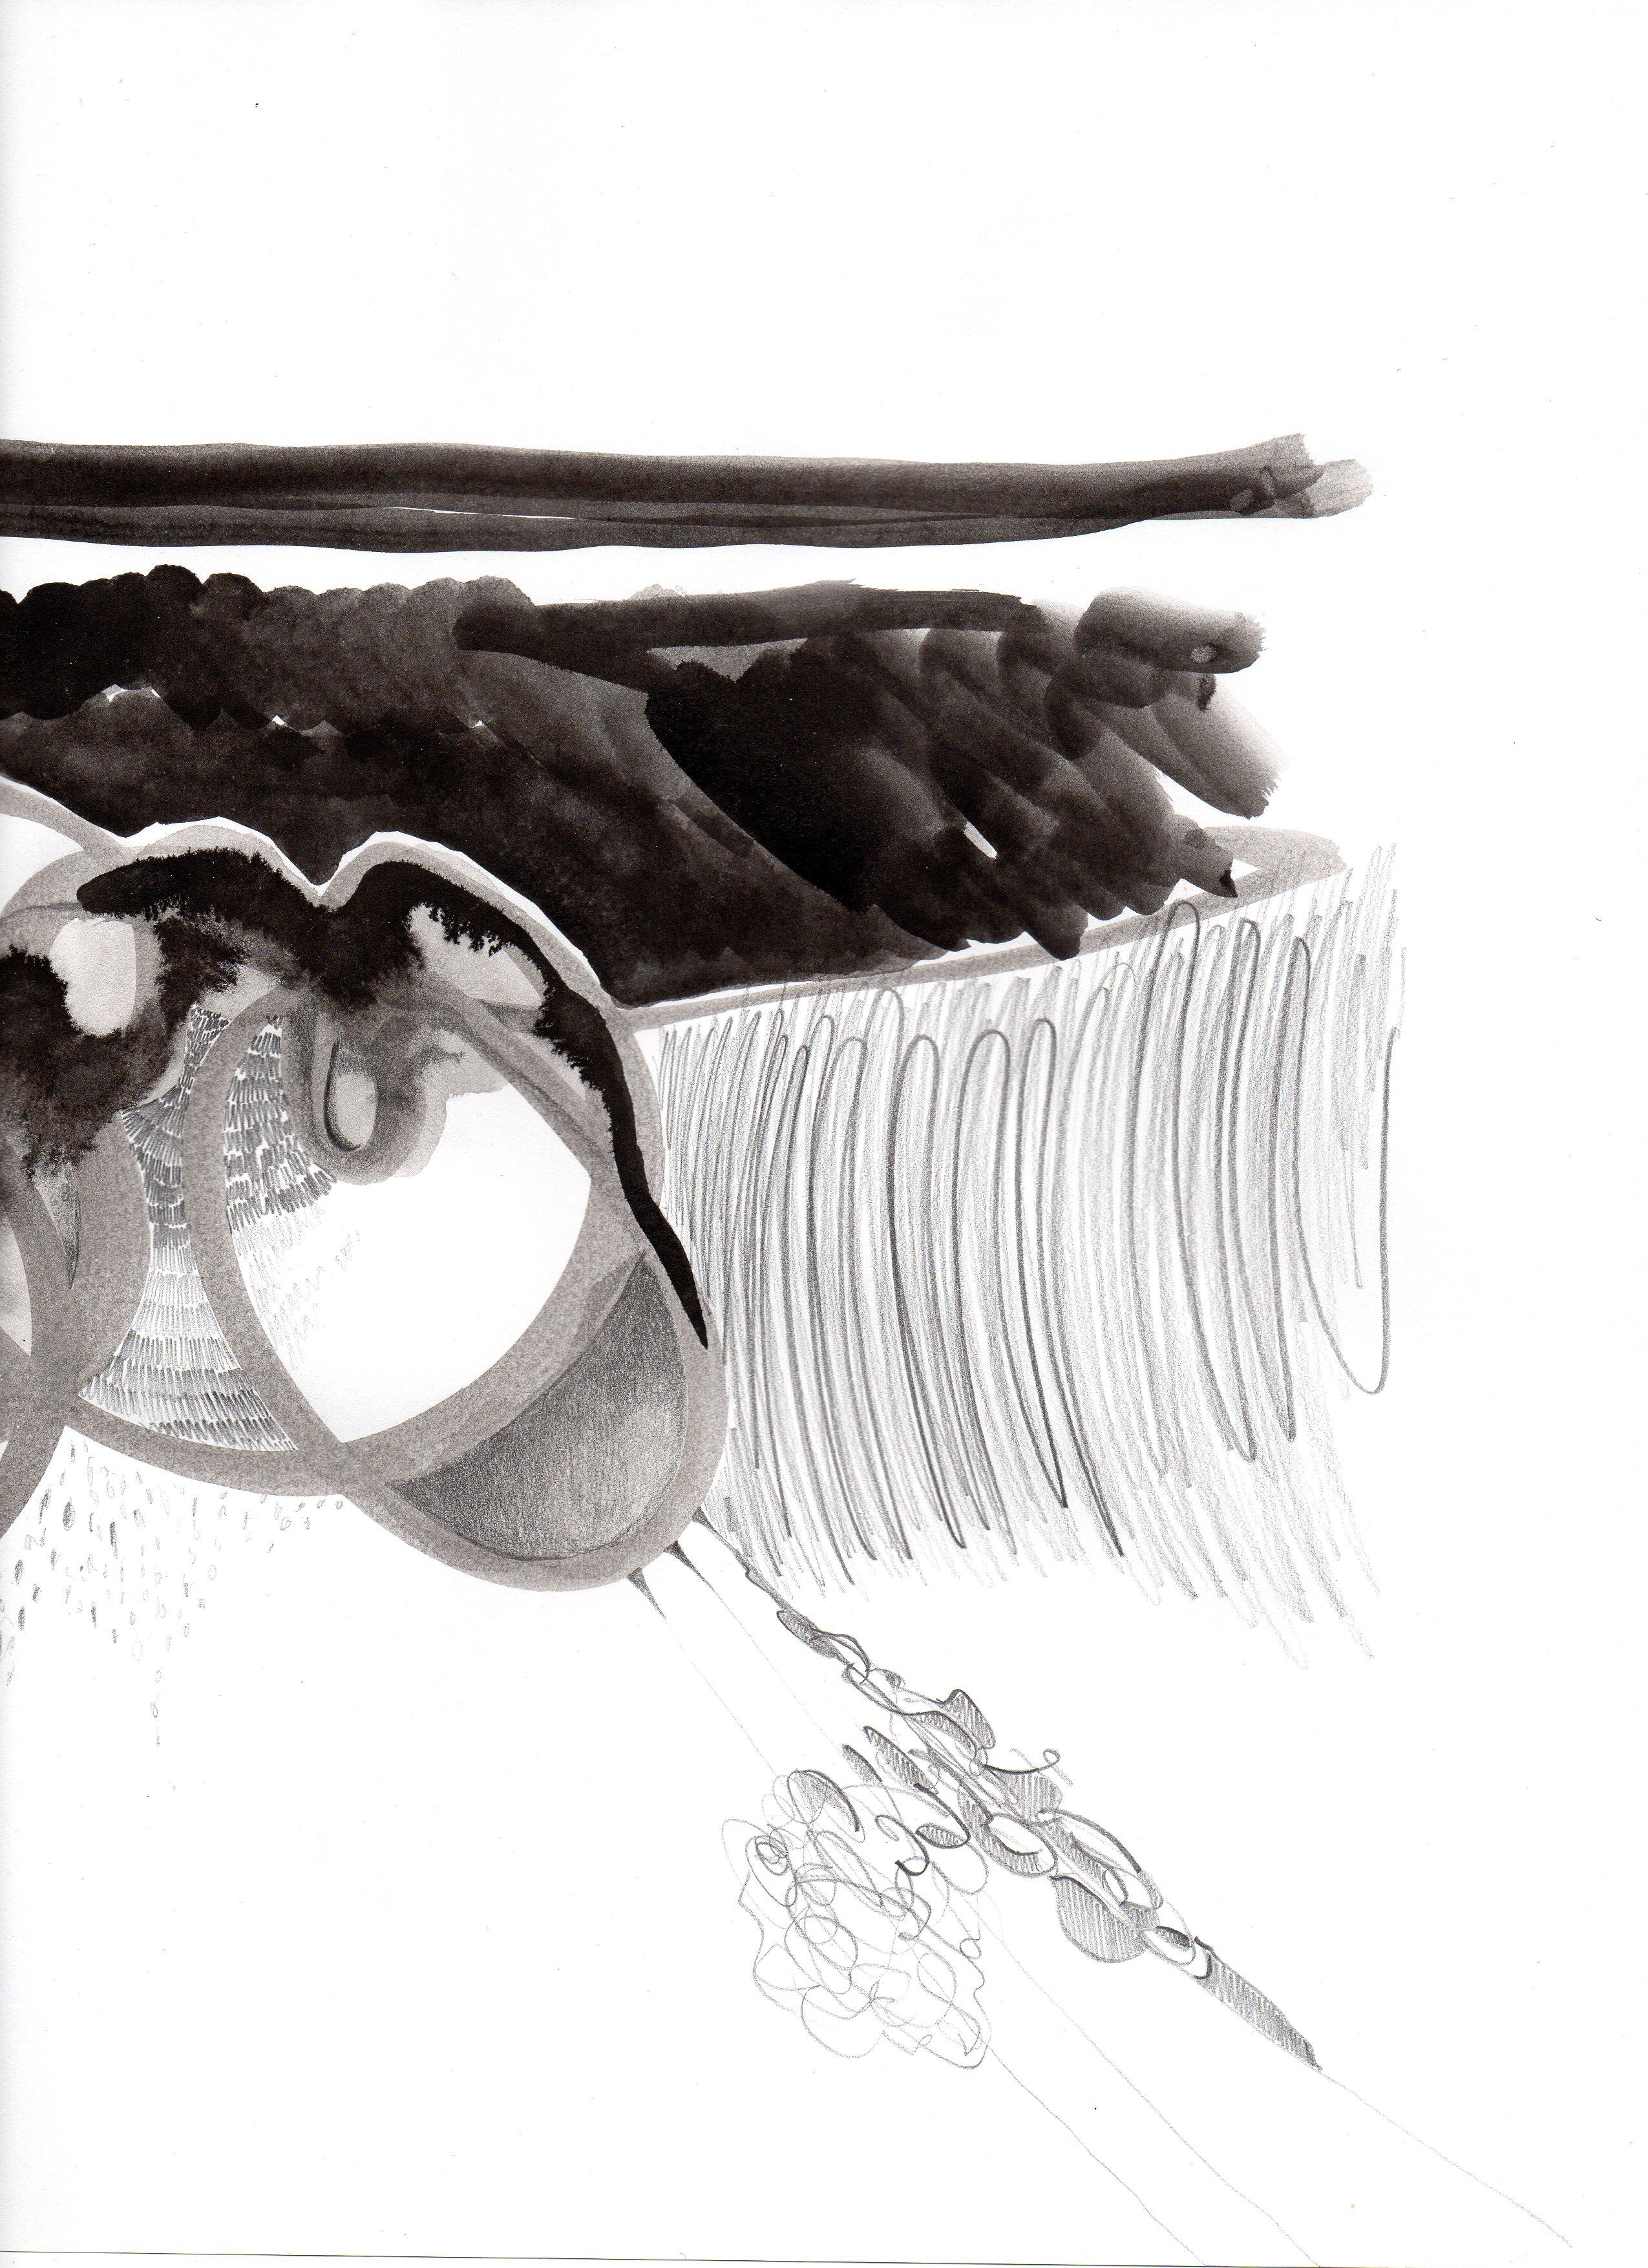 The third eye - potlood en inkt op papier - Suzanne Bodde 2016